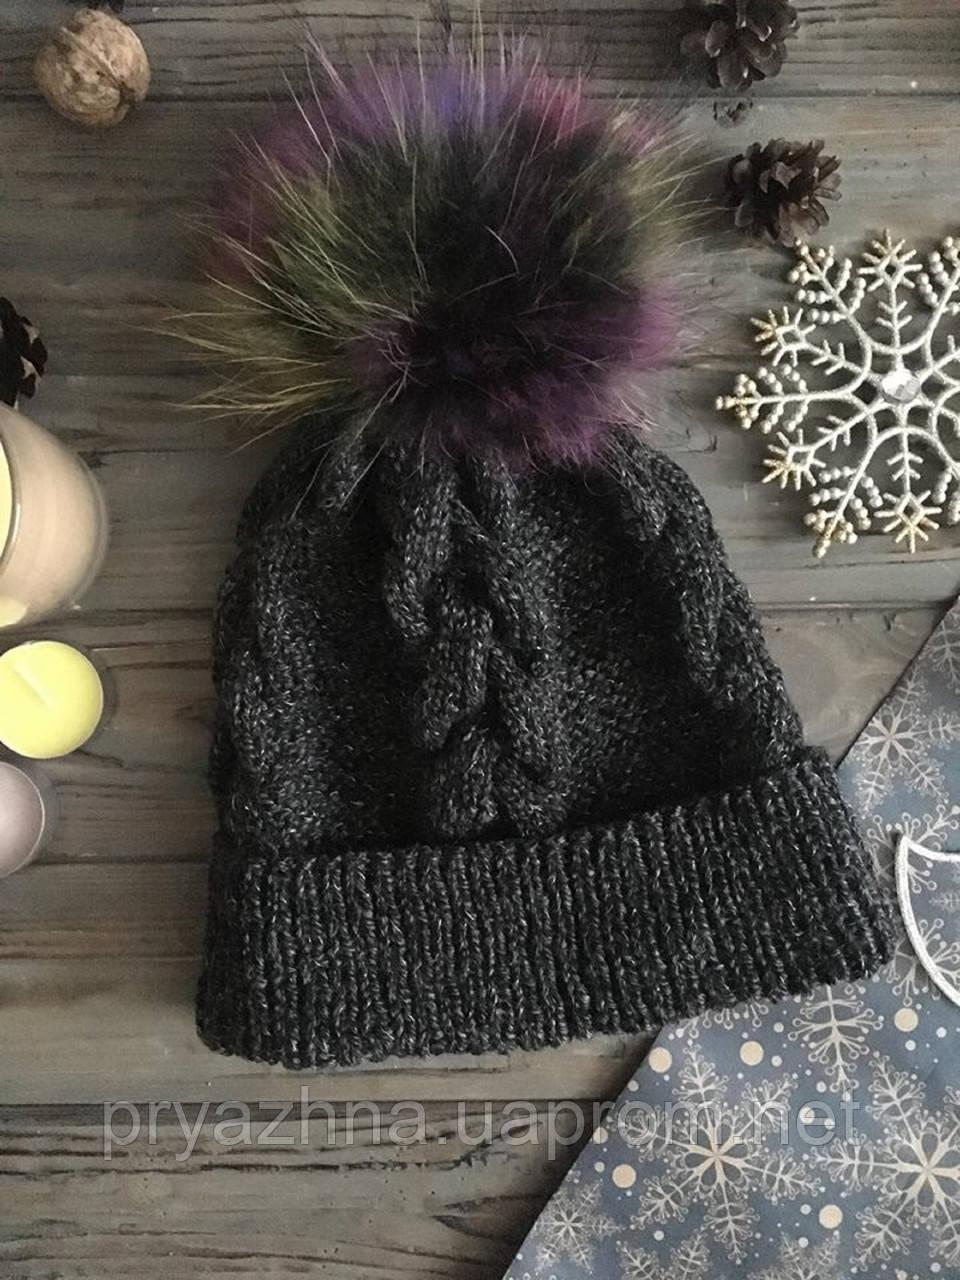 вязаная шапка с меховым помпоном шерстяная шапка модная вязаная